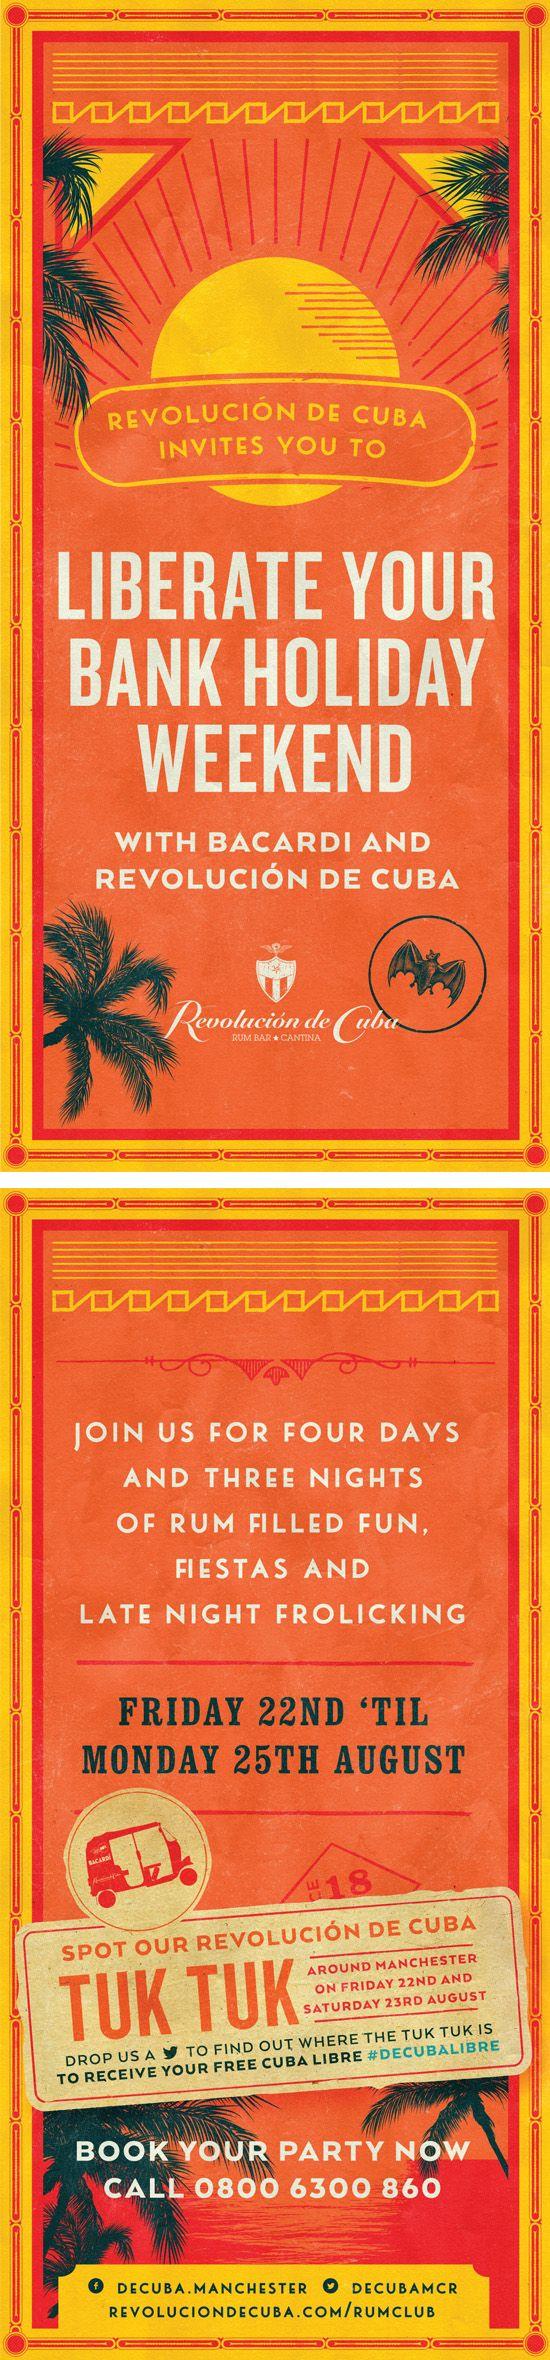 Cuban, Colourful Graphic Design Flyer for Revolucion de Cuba by www.diagramdesign.co.uk